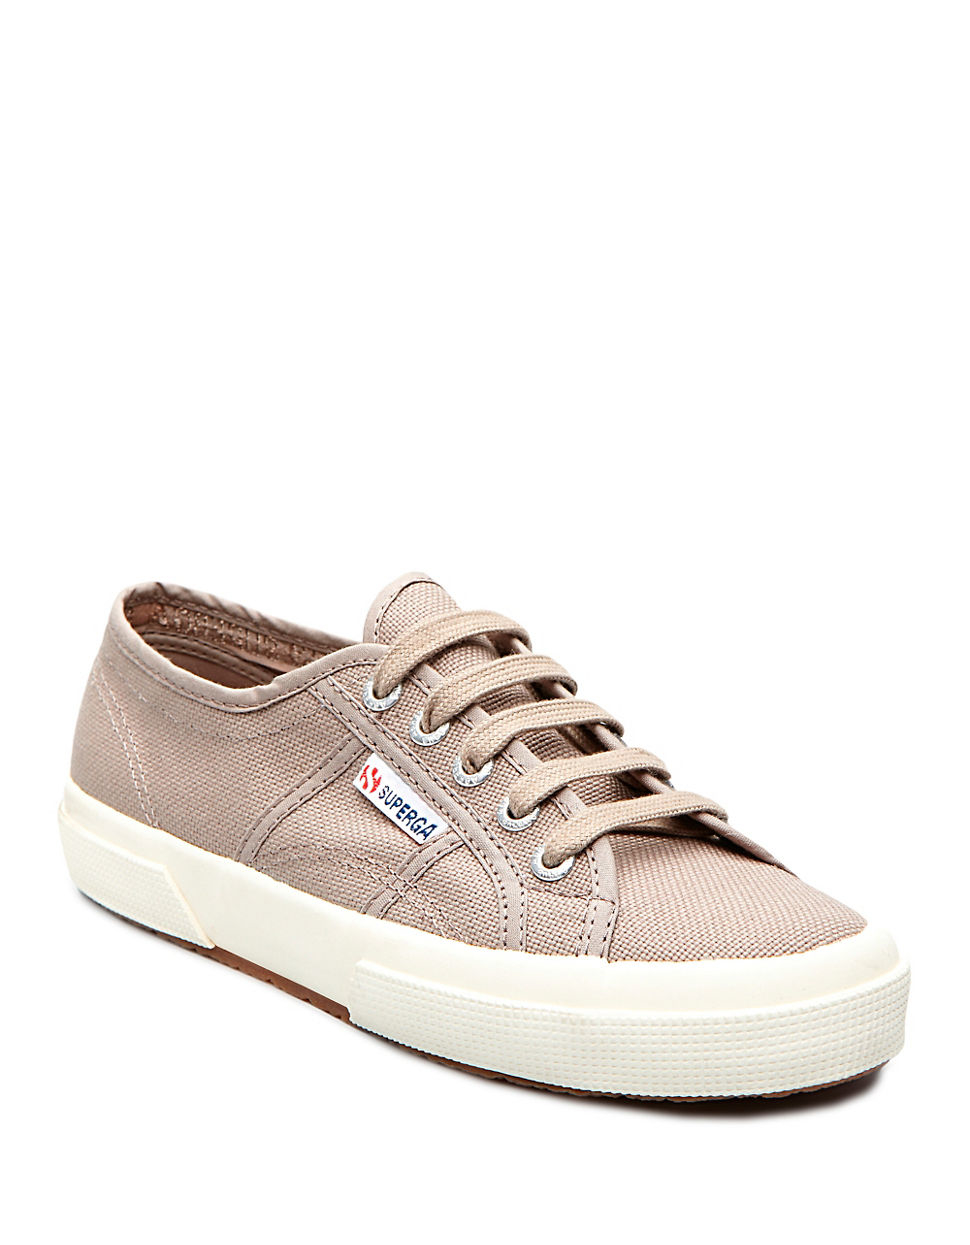 Superga: Superga Cotu Classic Sneakers In Brown